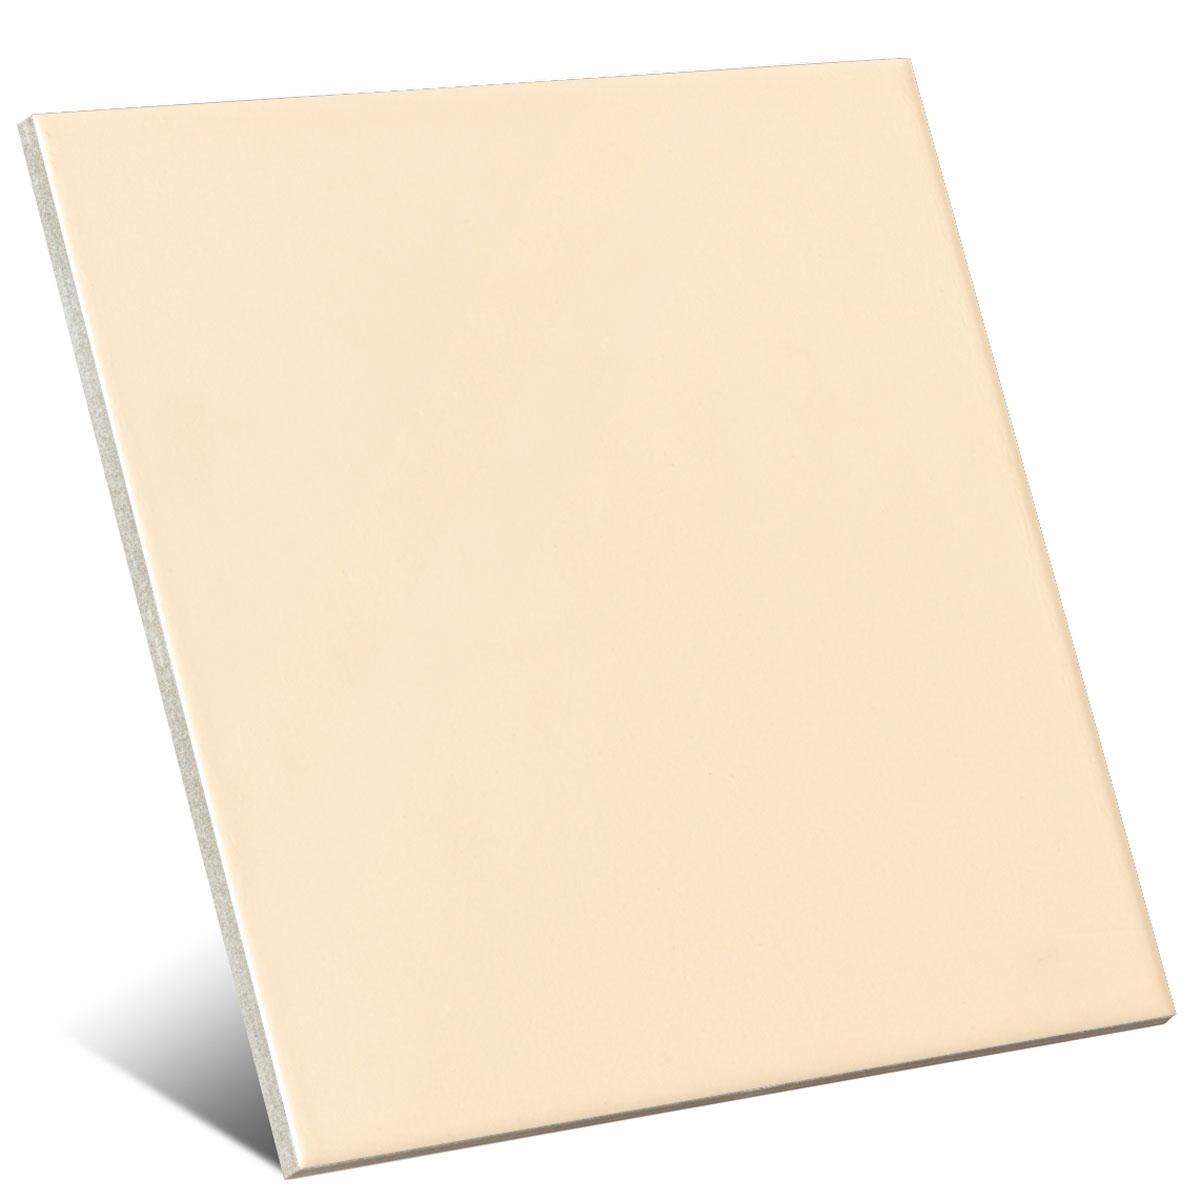 Color beige mate 20x20 cm (caja 1 m2)